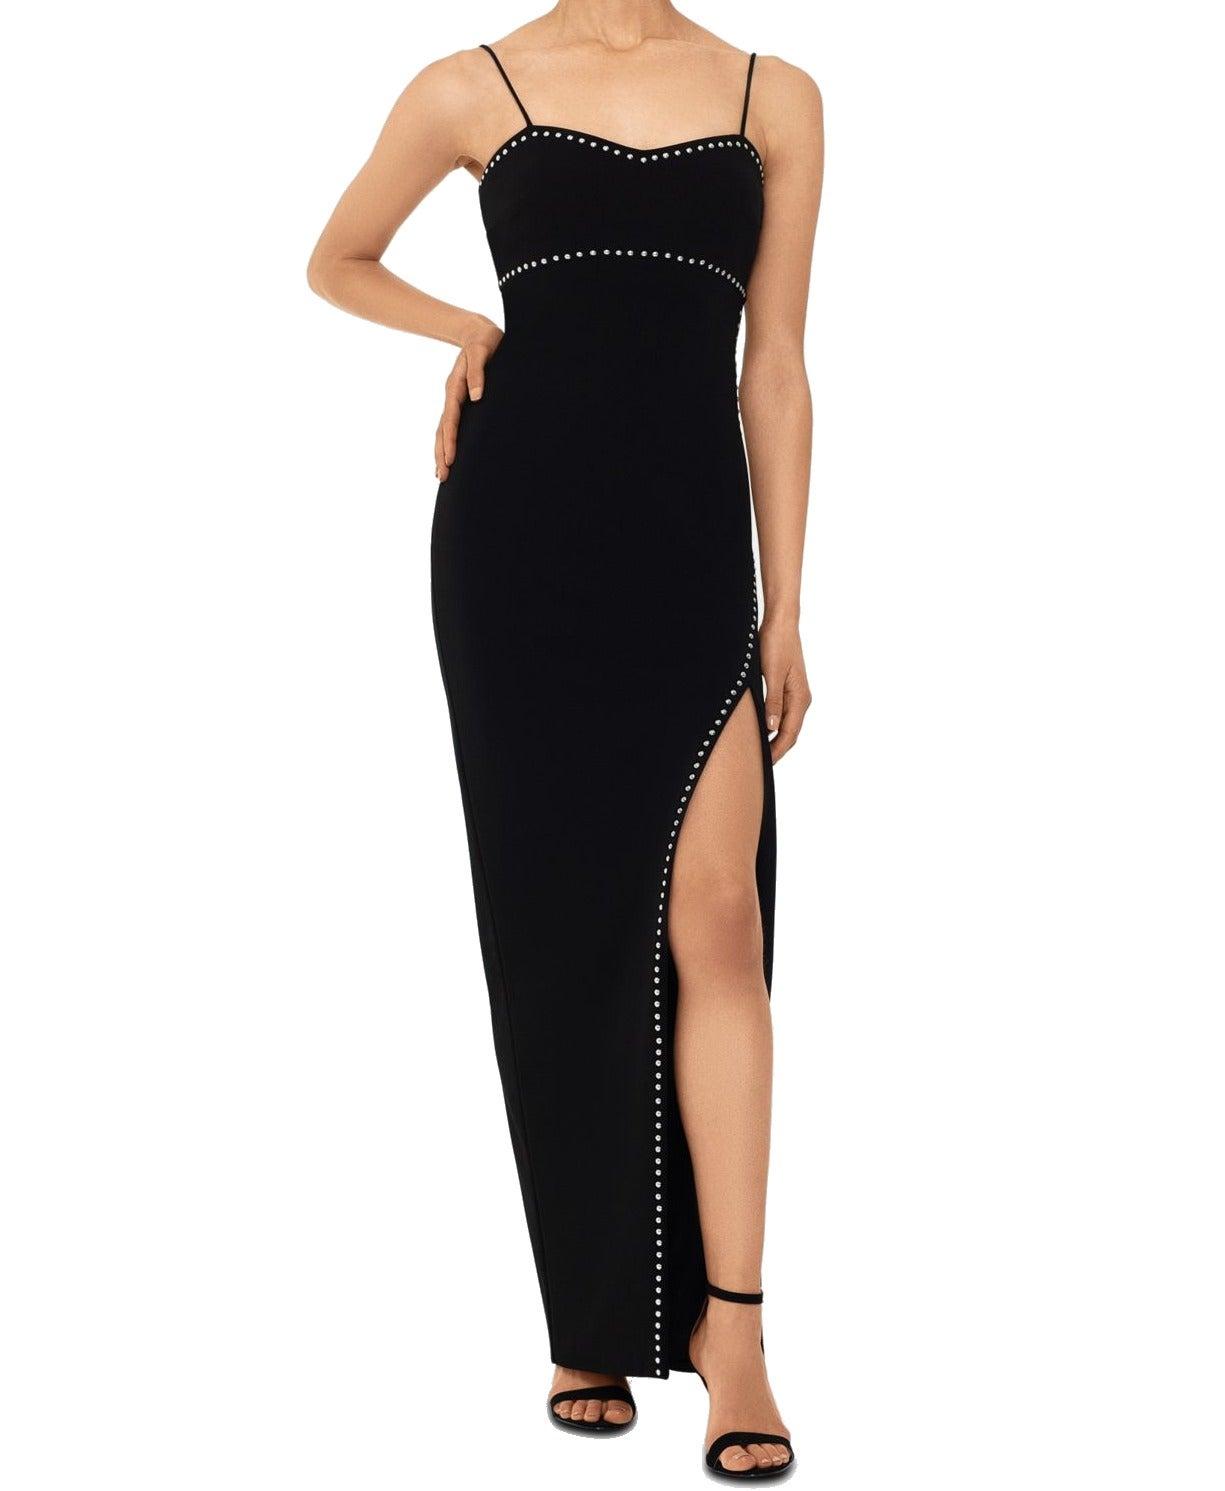 Xscape Women's Dress Black Size 12P Petite Studded High Split Gown